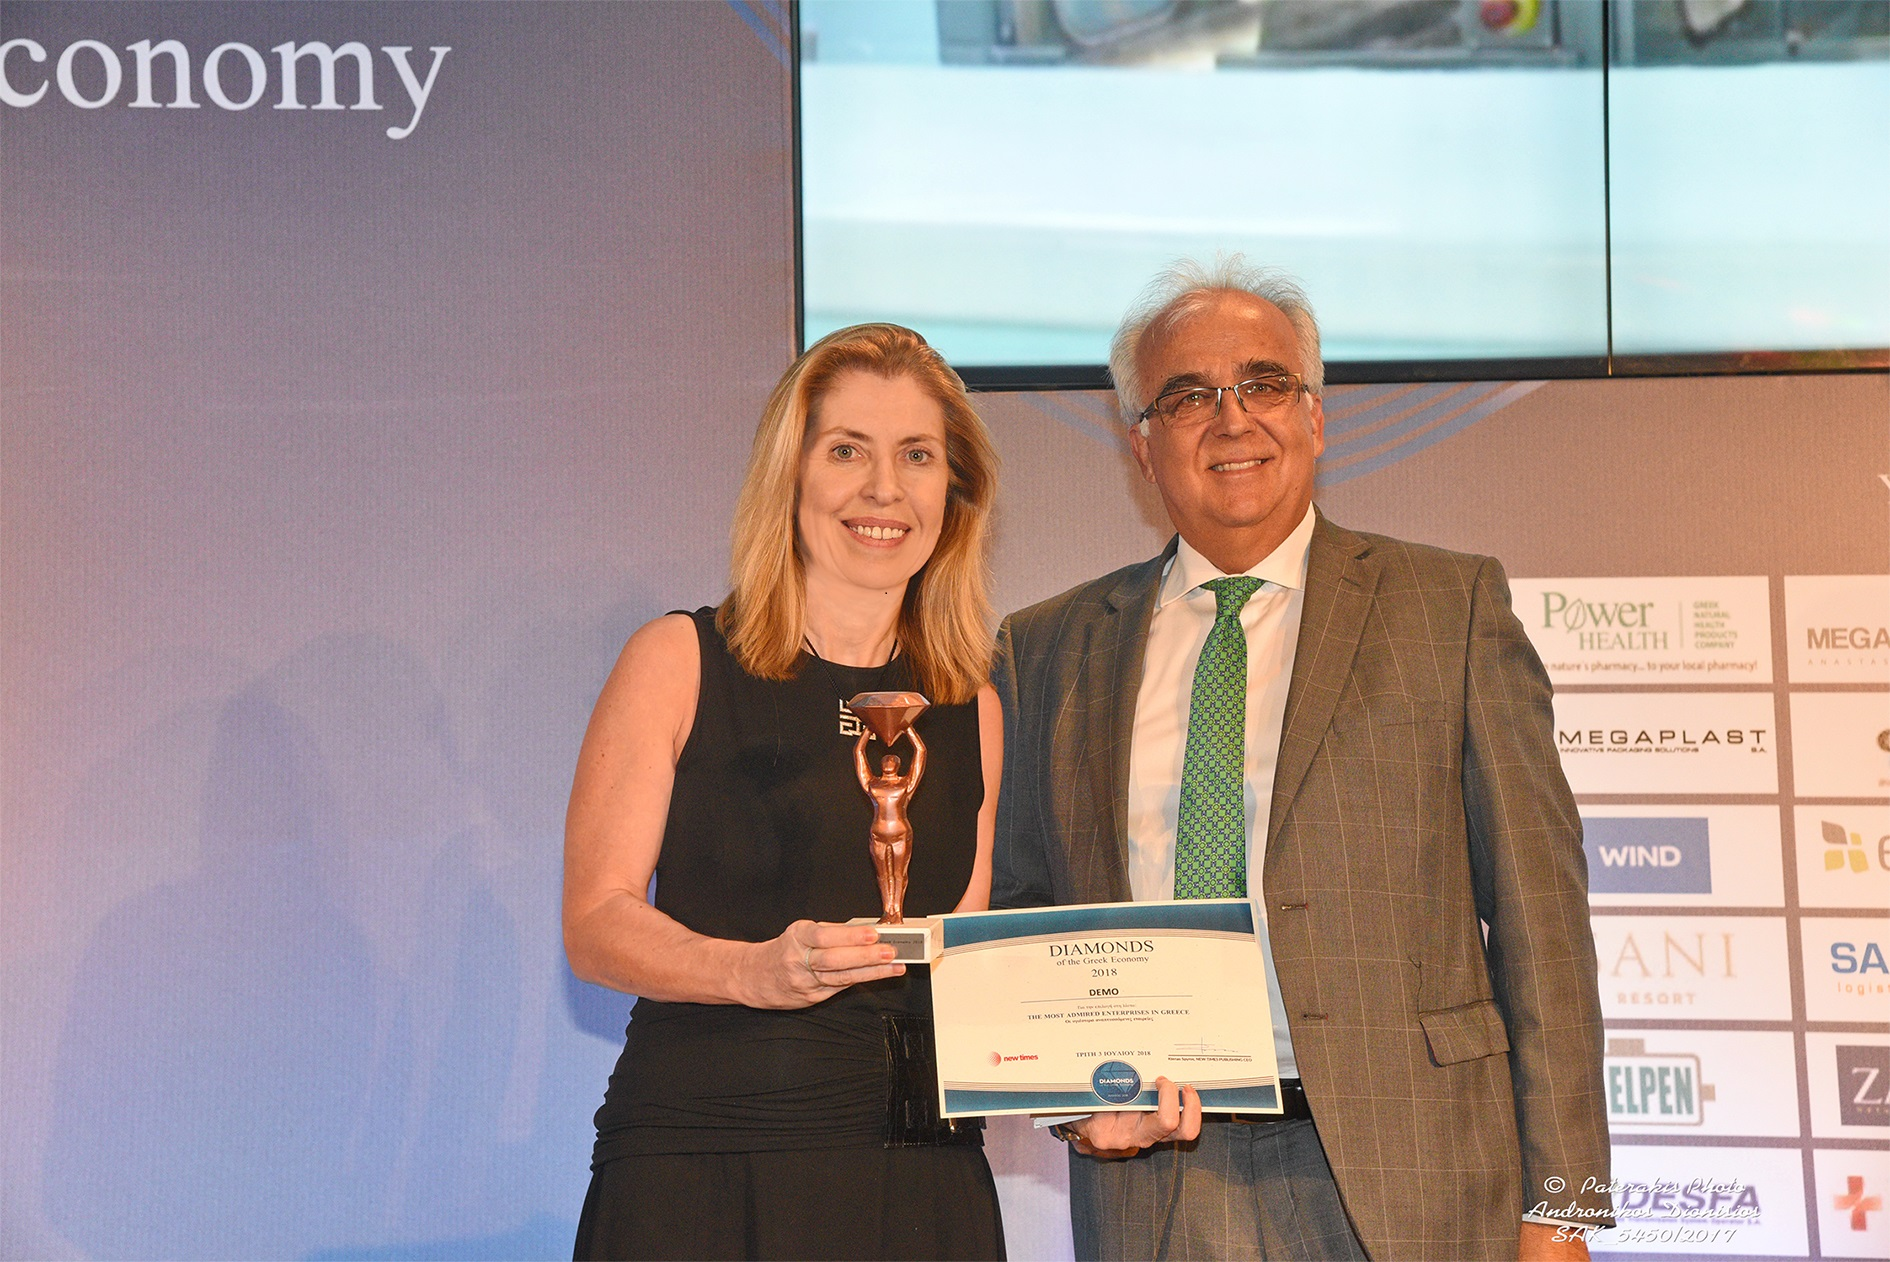 DEMO ΑΒΕΕ: Για άλλη μια χρονιά η ελληνική φαρμακοβιομηχανία βραβεύτηκε στα «Diamonds of the Greek Economy 2018»